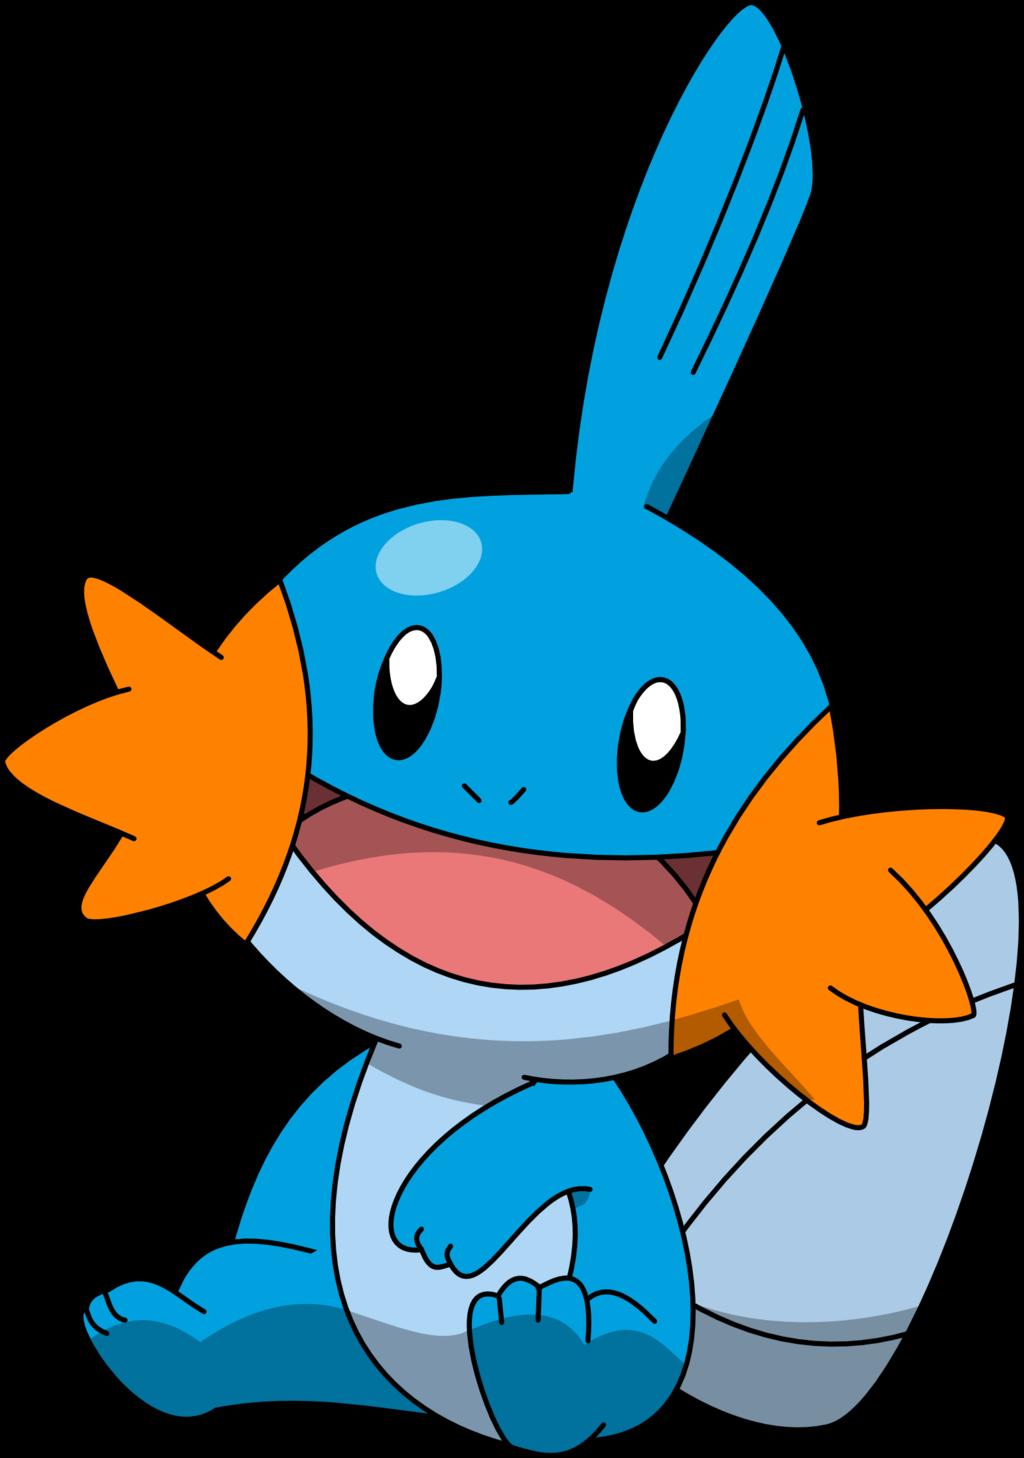 Cuál(es) es(son) tu(s) pokémon favorito(s) :v? 258_mudkip_by_pklucario-d5z1jsn